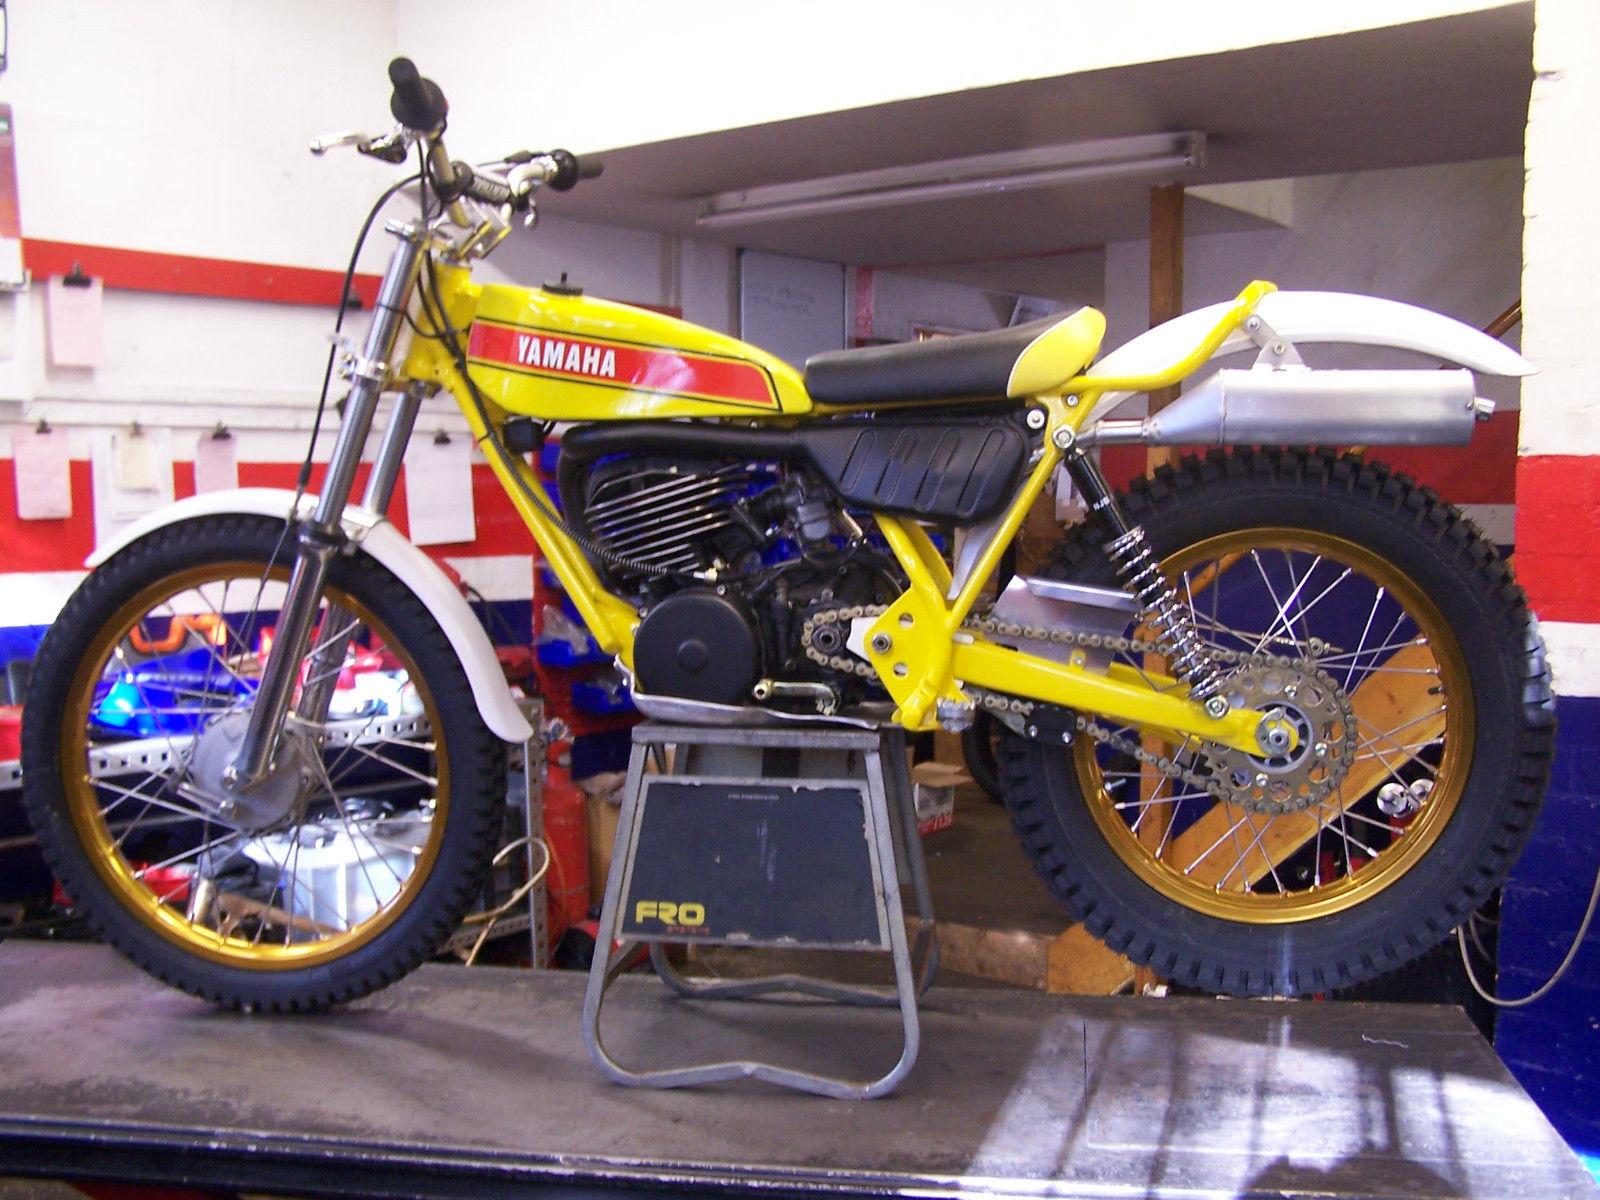 Ty yamaha 250 majesty trials 2014 for Yamaha trials bike